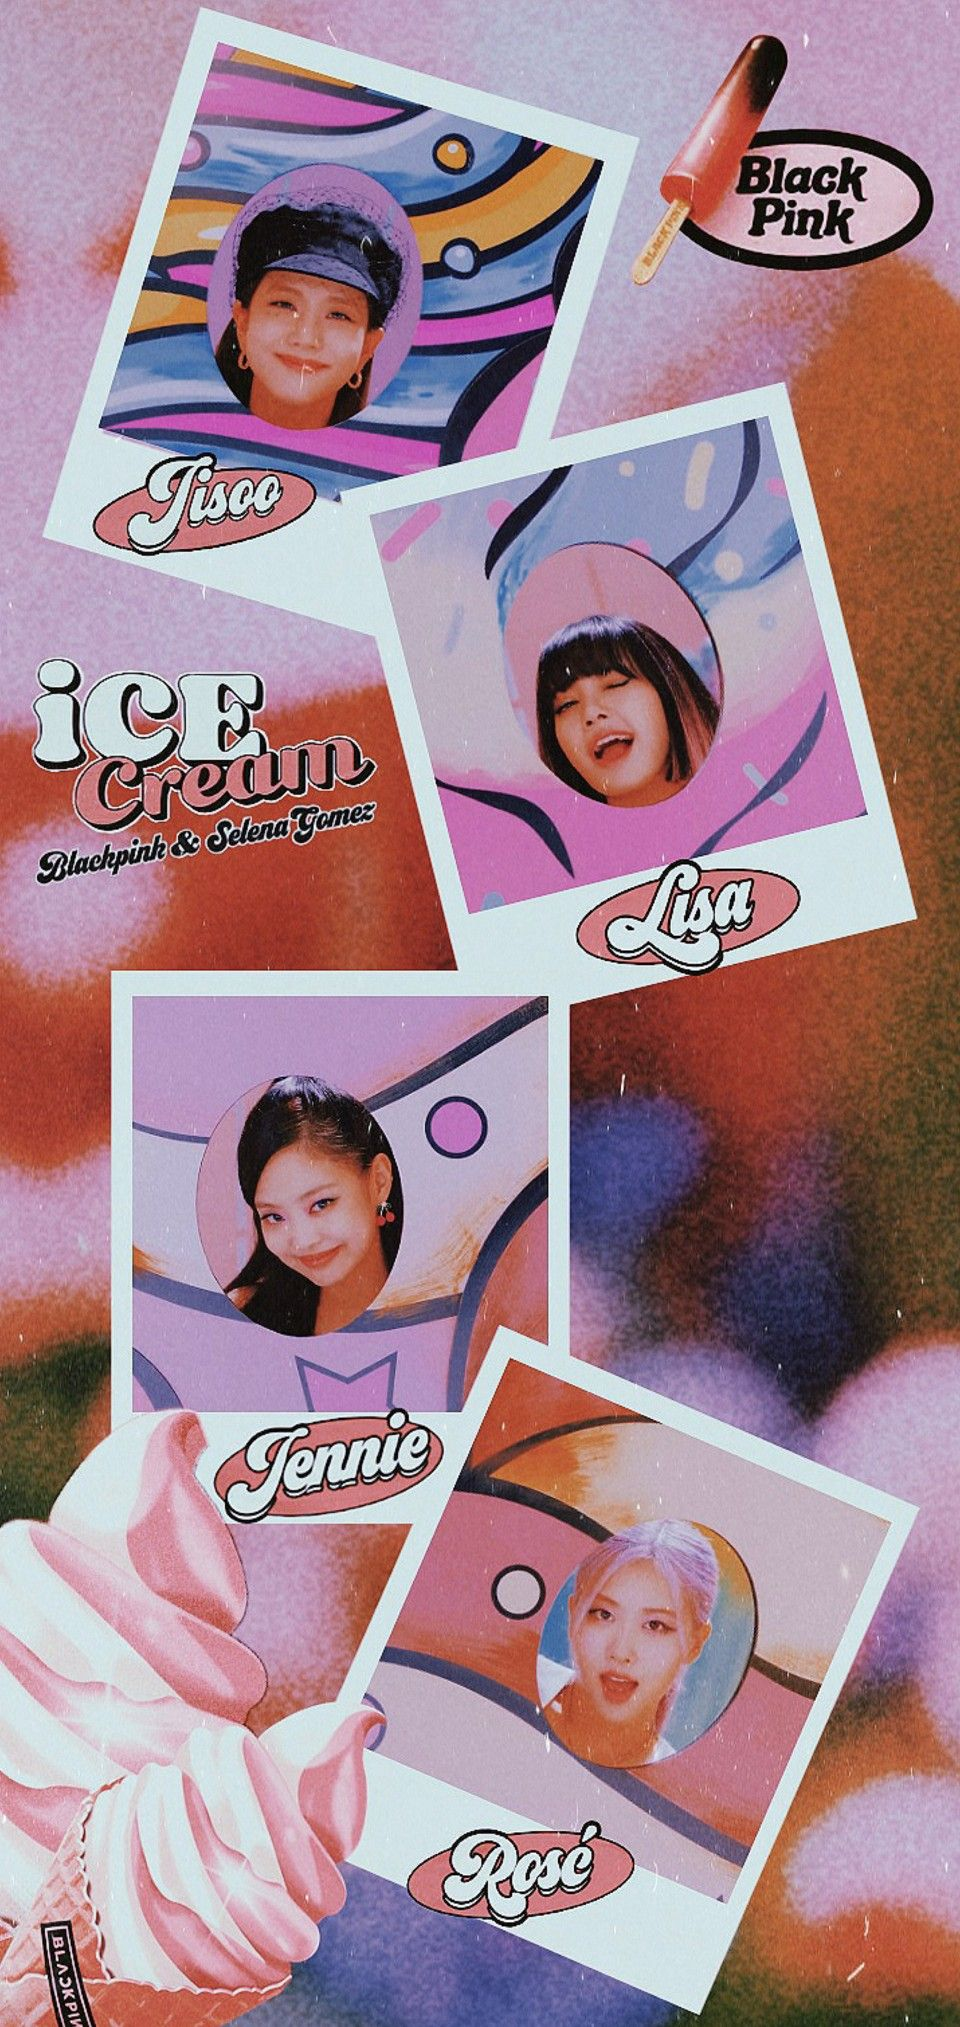 BLACKPINK ICE CREAM Wallpaper em 2020 Blakpink, Cantores